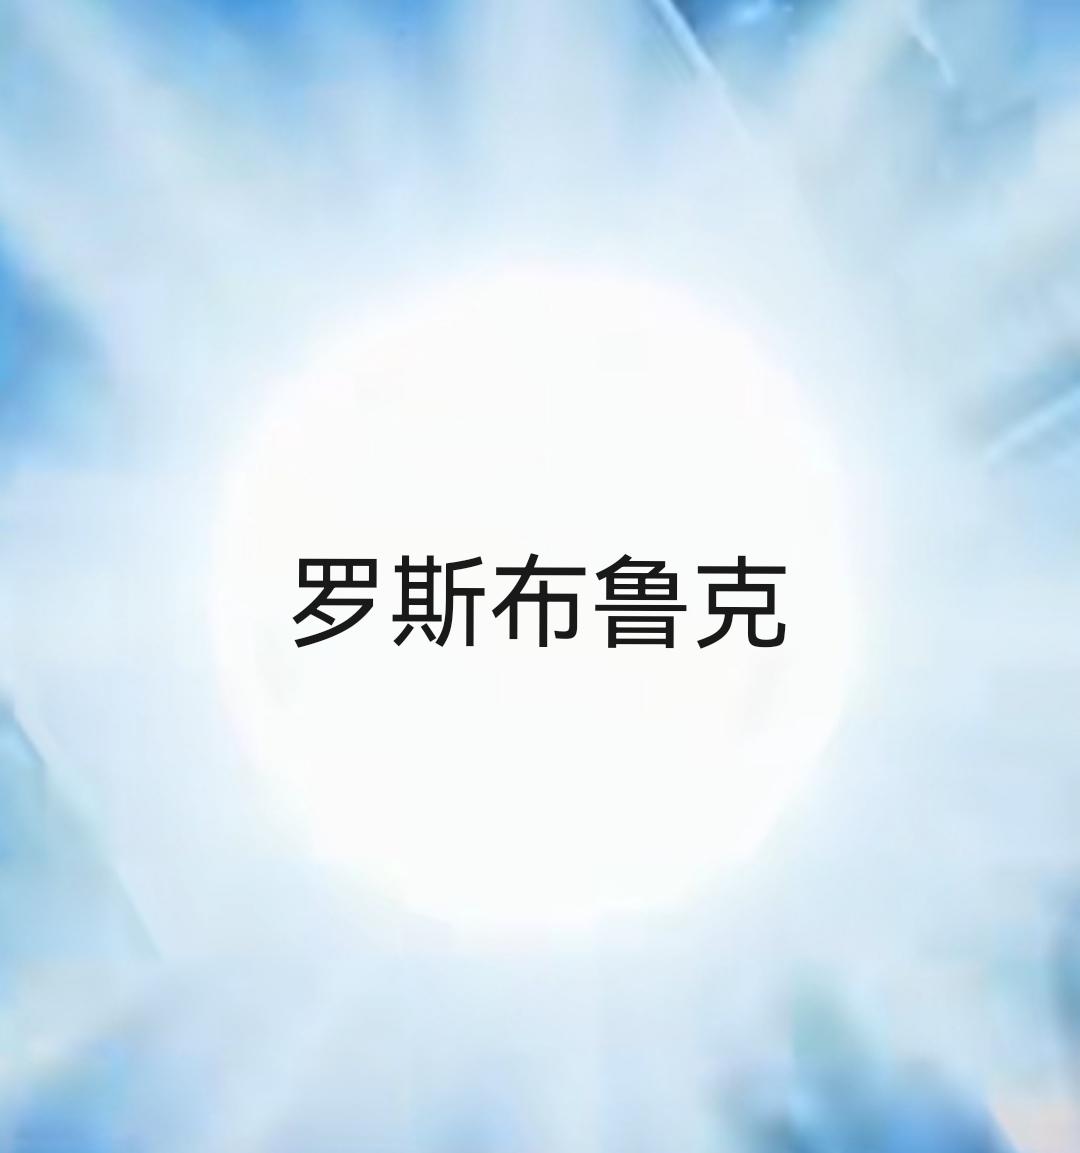 Tong Guo